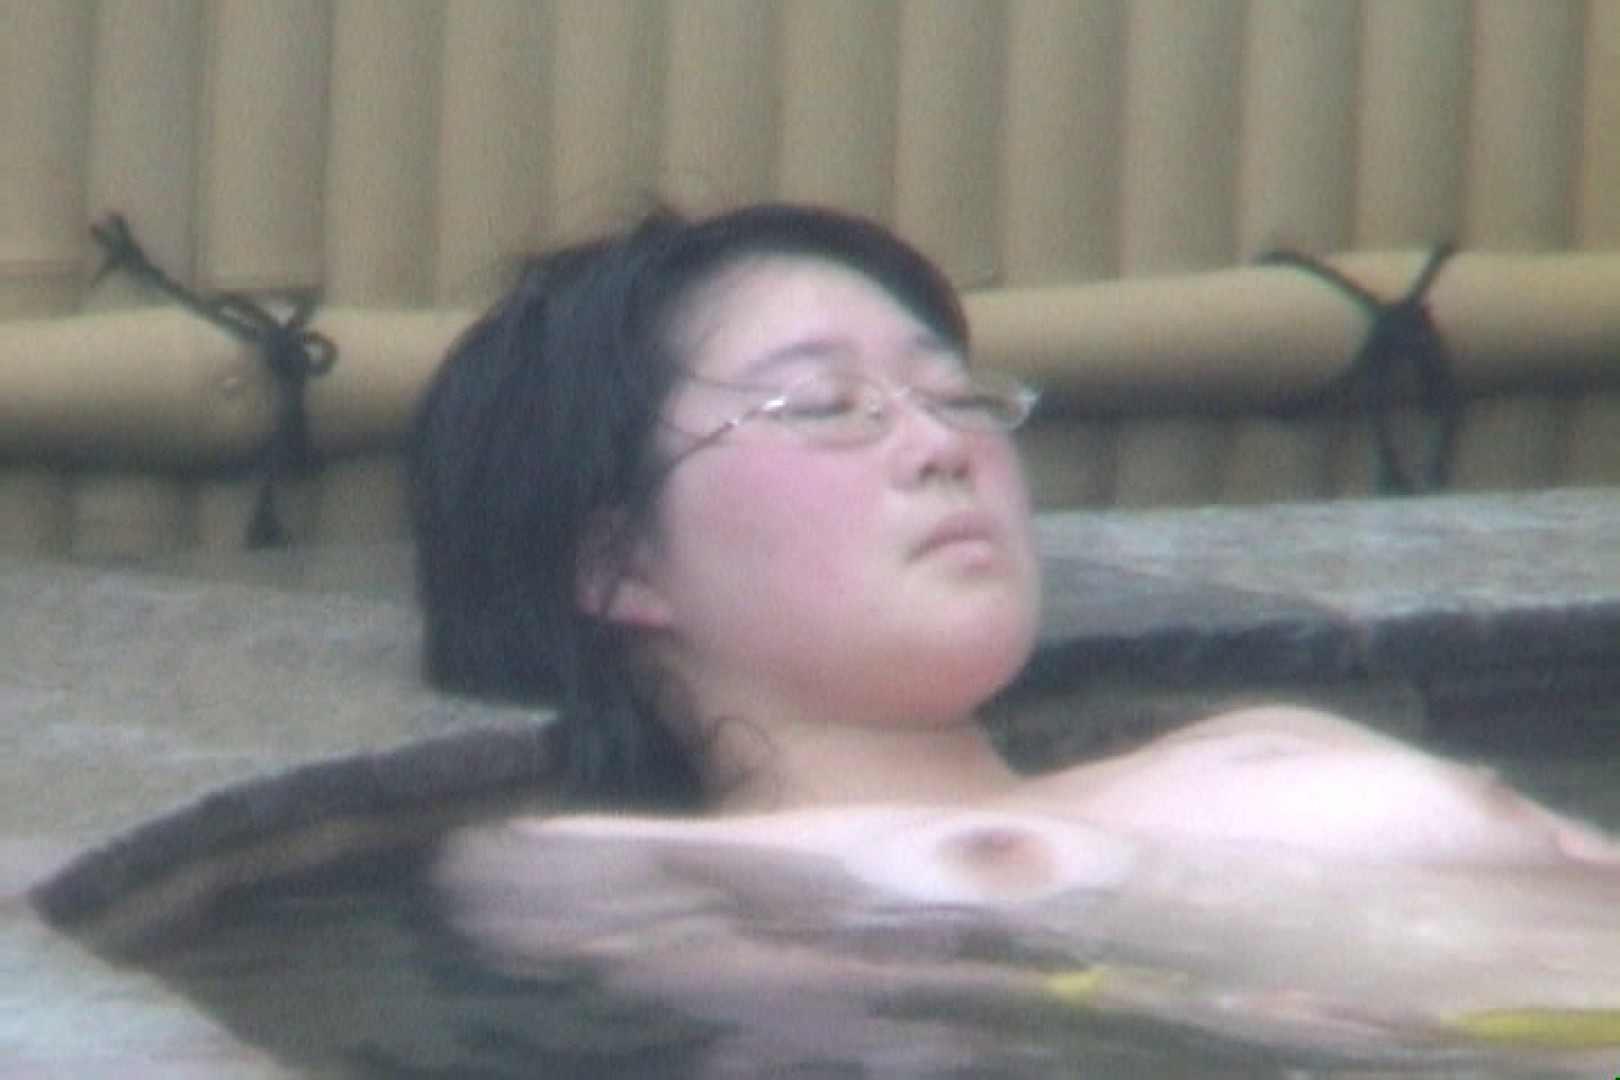 Aquaな露天風呂Vol.46【VIP限定】 露天風呂突入  76pic 12